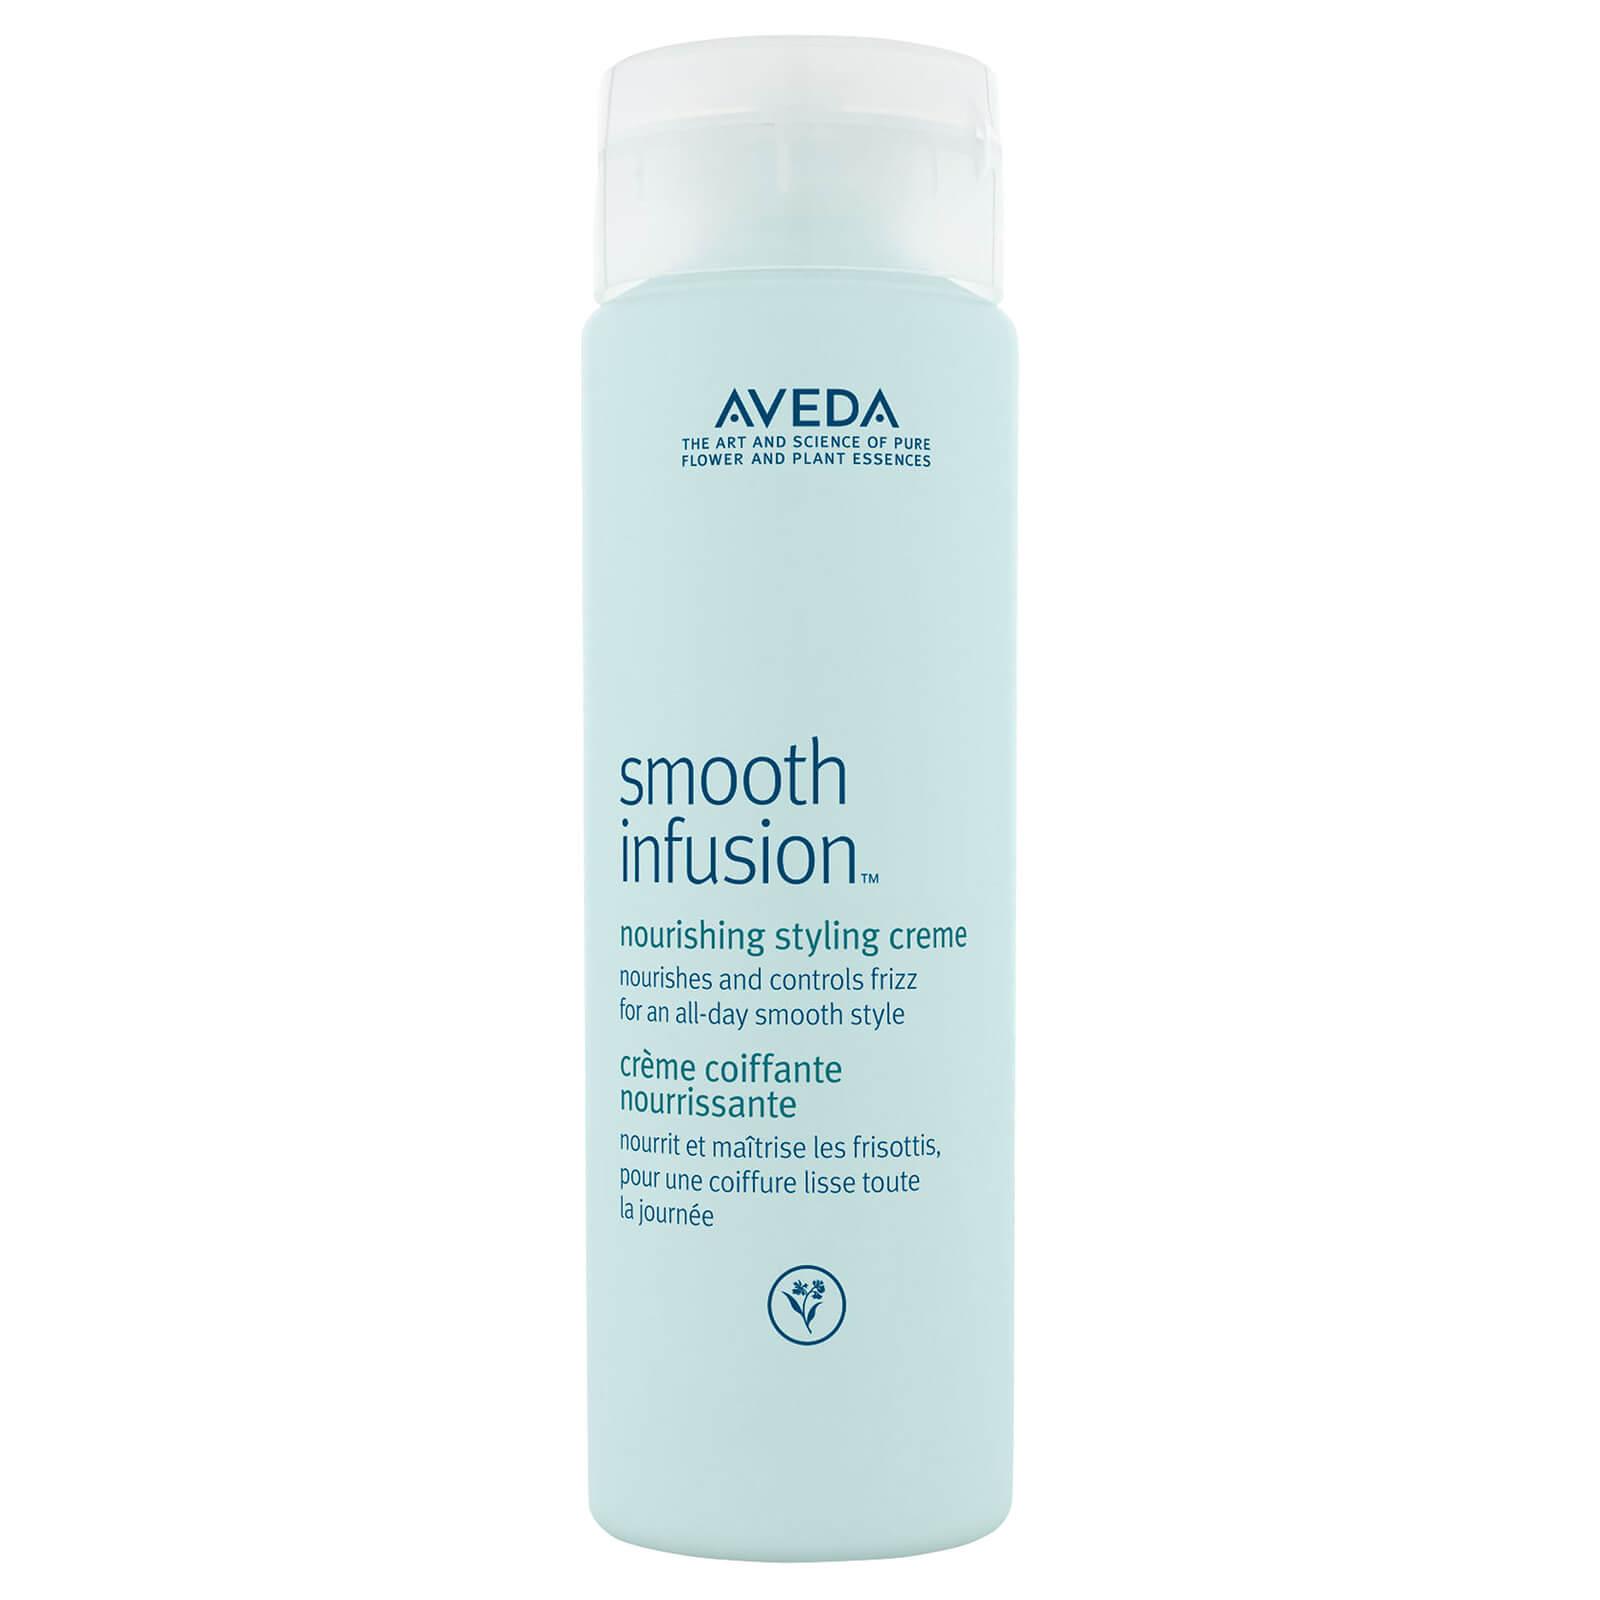 Aveda Smooth Infusion Nourishing Styling Creme (250ml)